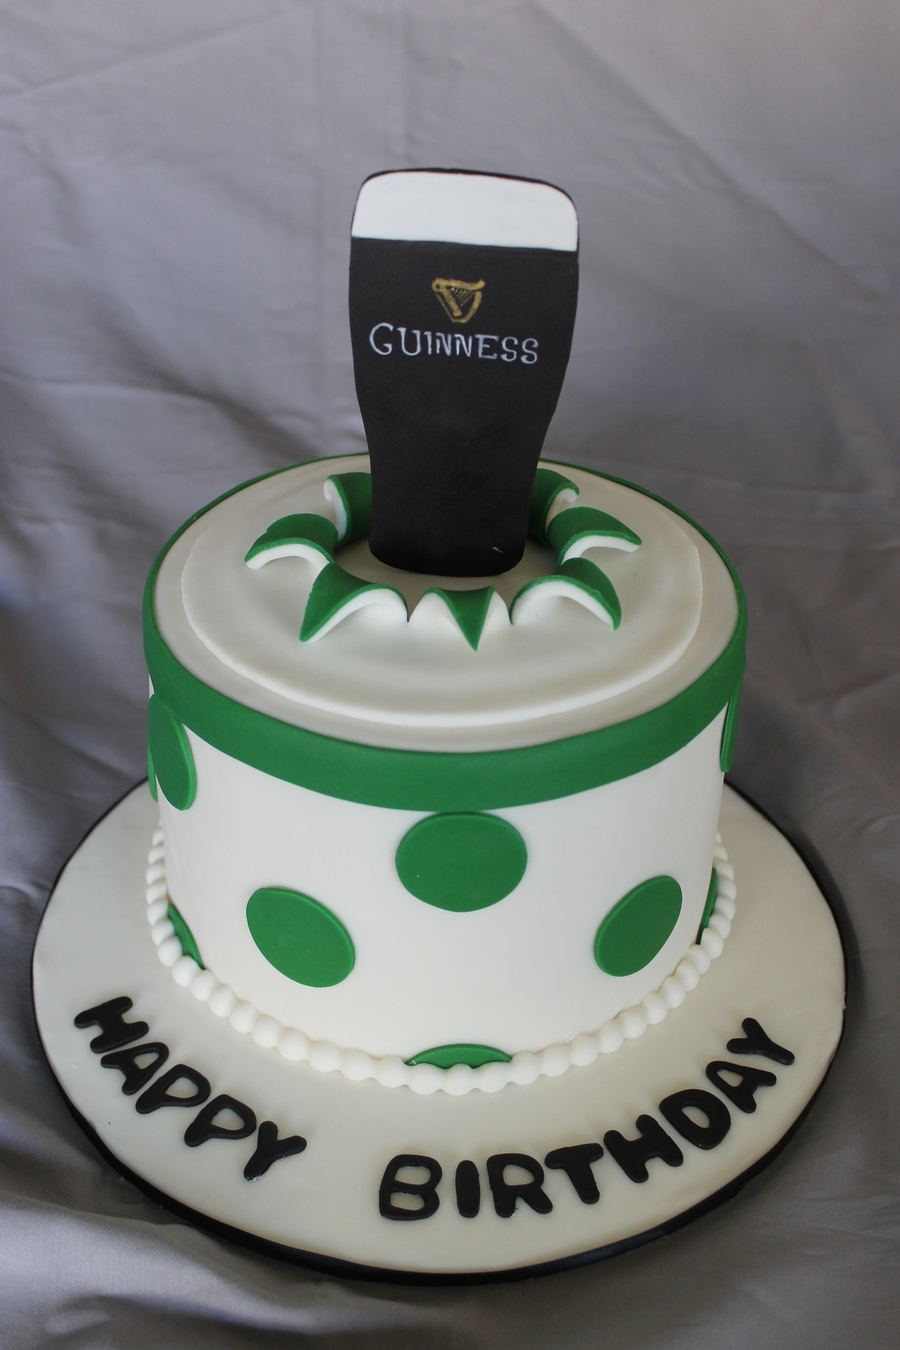 Excellent Guiness Beer Birthday Cake Cakecentral Com Birthday Cards Printable Benkemecafe Filternl